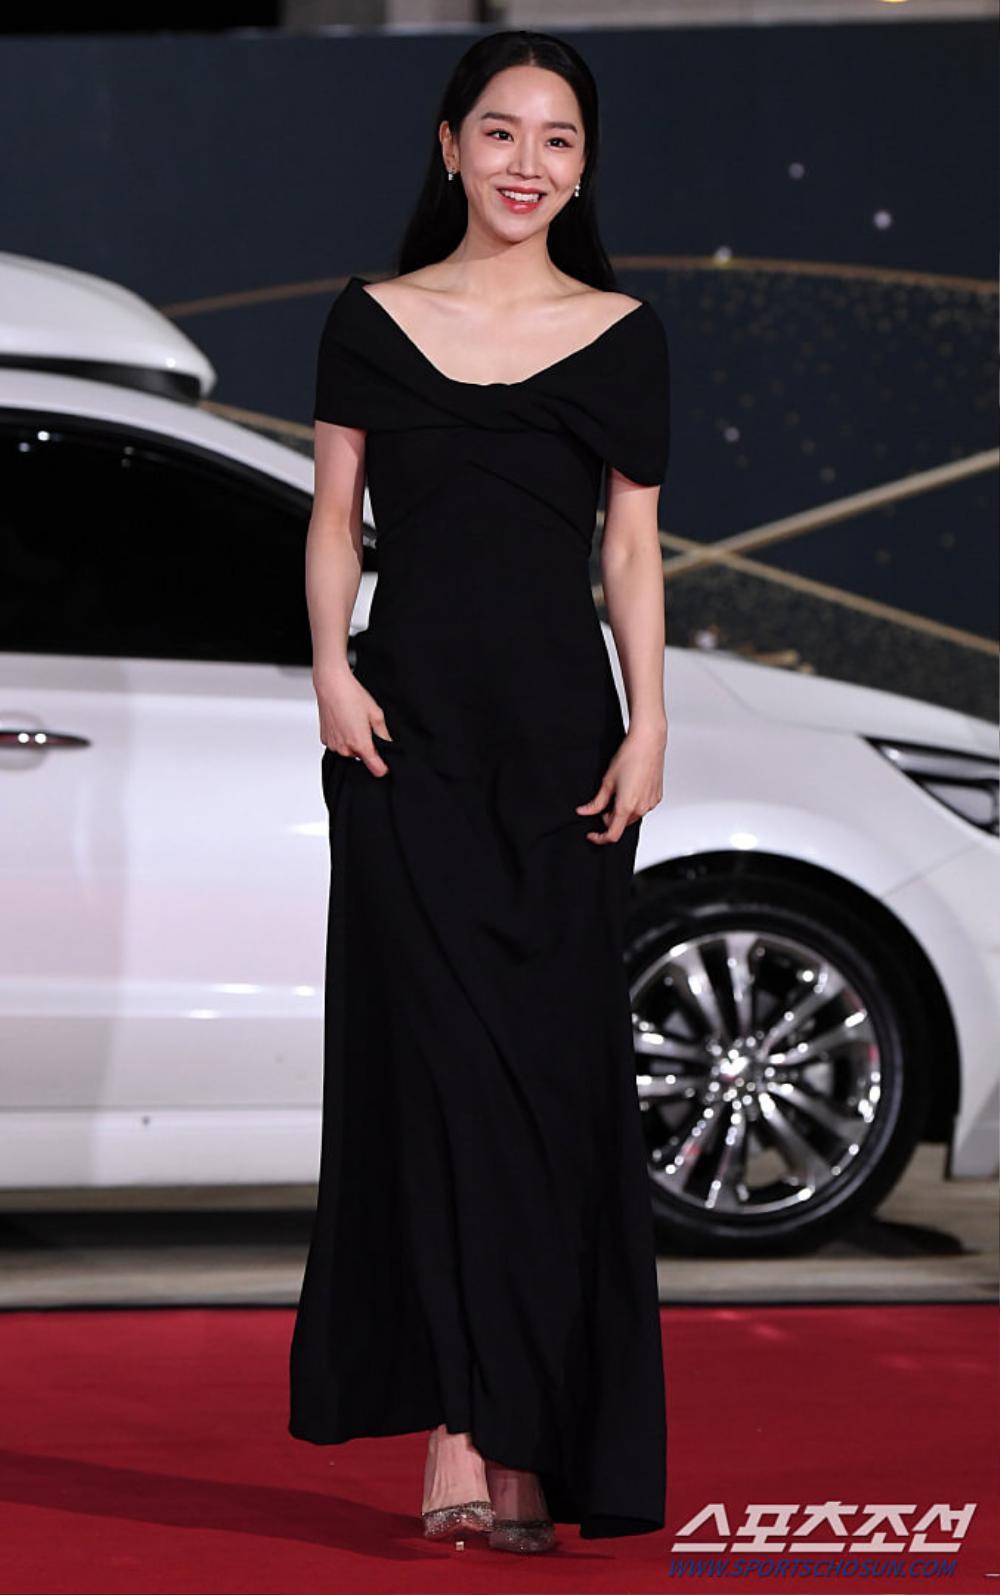 Thảm đỏ 'Rồng xanh 2020': Shin Hye Sun 'cân sắc' Shin Min Ah, Jung Woo Sung - Lee Byung Hun điển trai! Ảnh 15